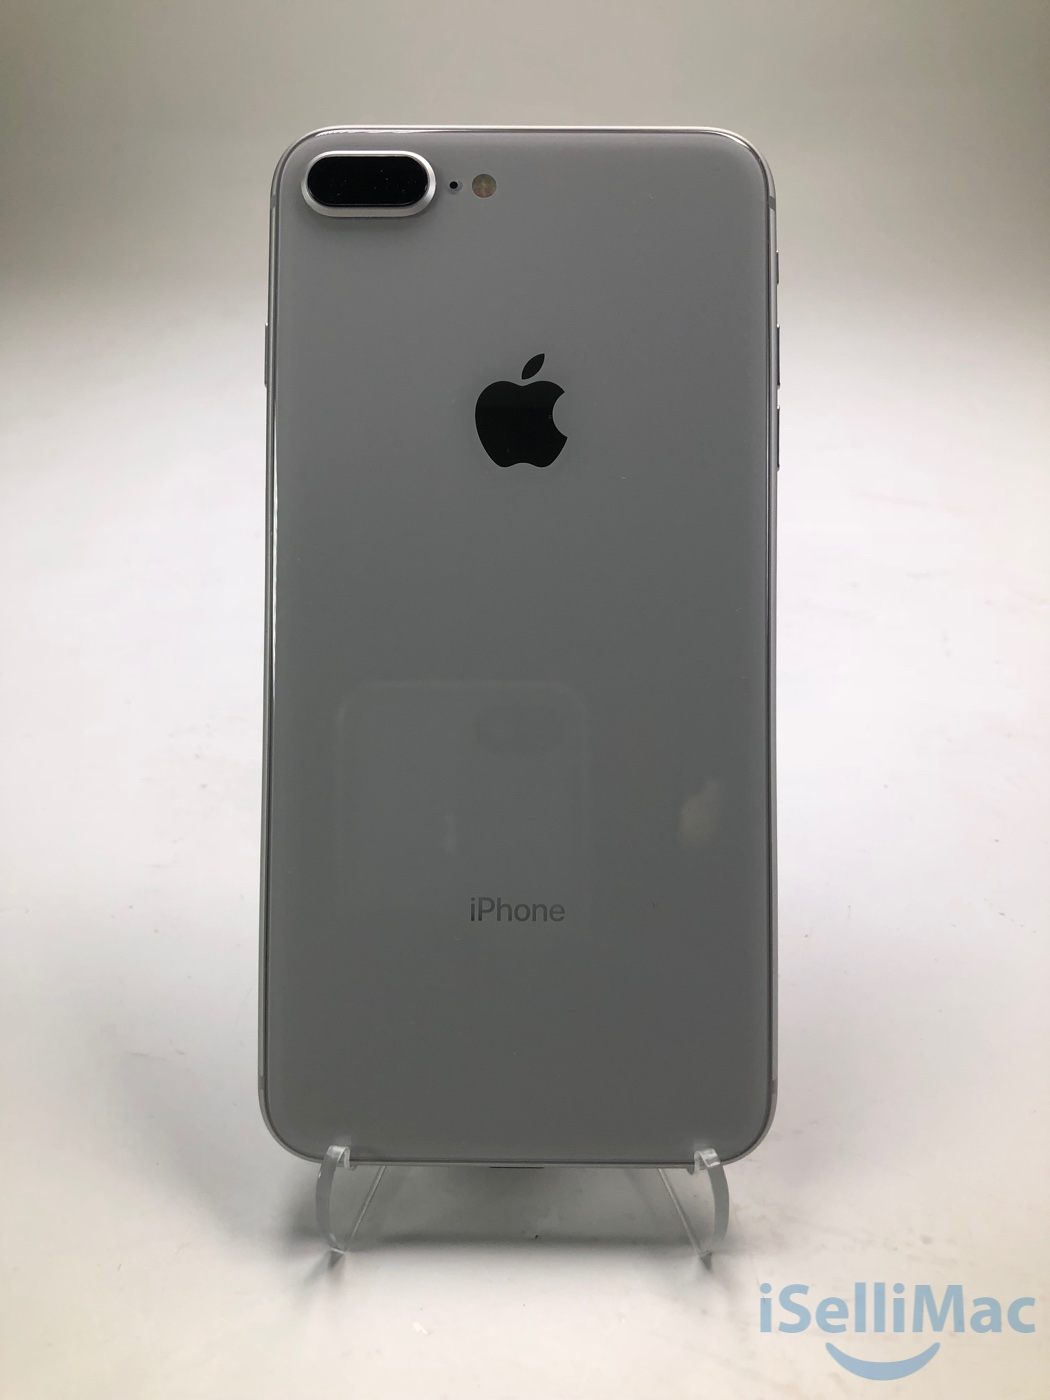 Details about Apple AT&T IPhone 8 Plus 64GB Silver MQ8U2LL/A + B Grade +  Warranty!